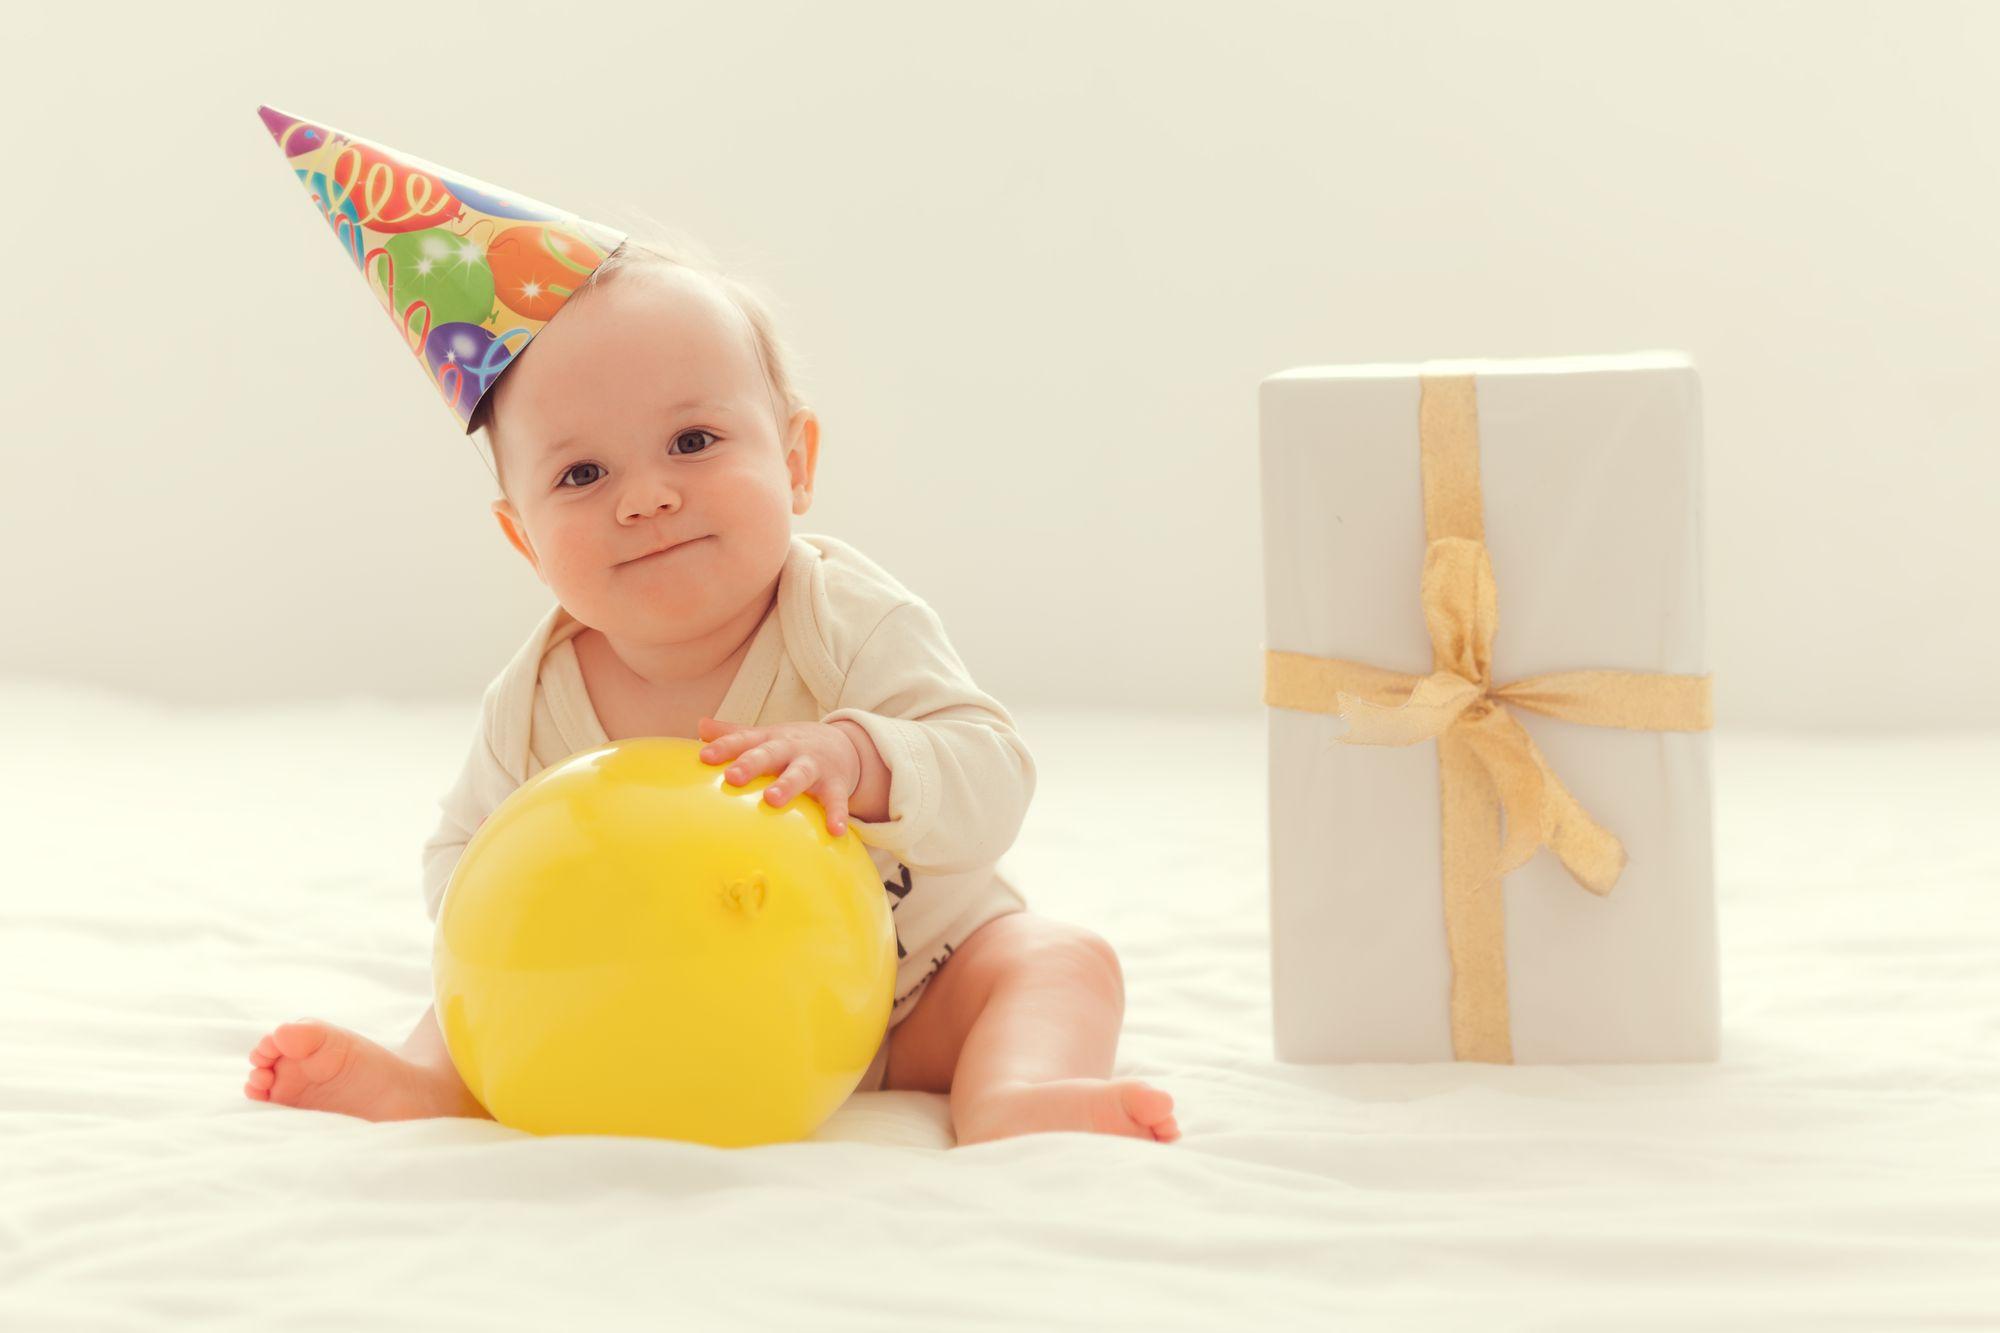 Free newborn photography for royal baby birthdays digital camera world